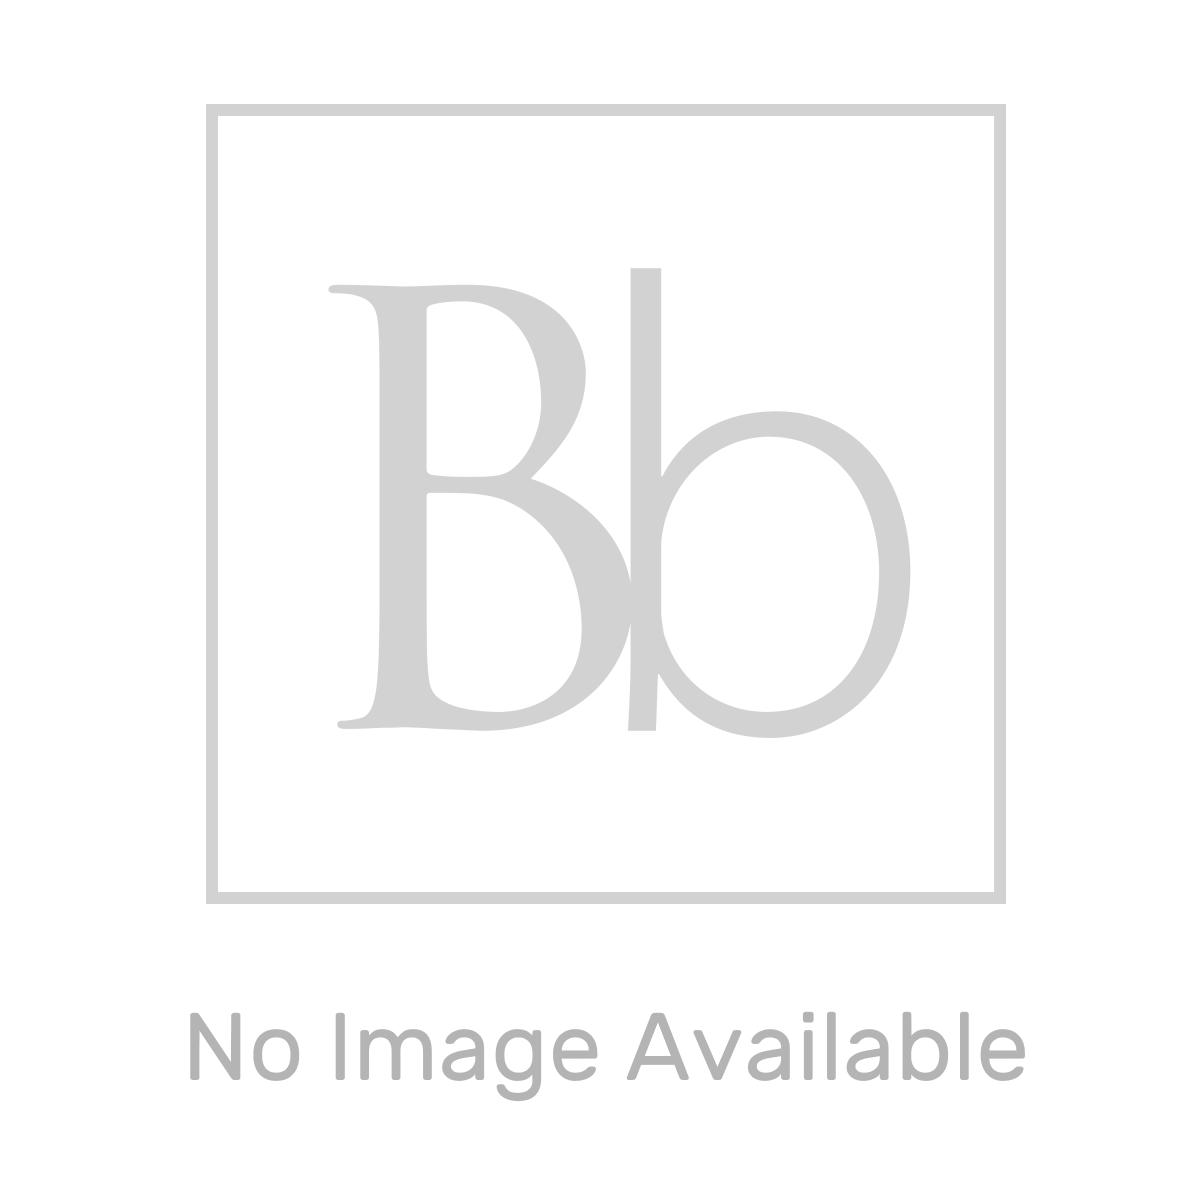 Aquadart Grey Slate Shower Tray 1700 x 800